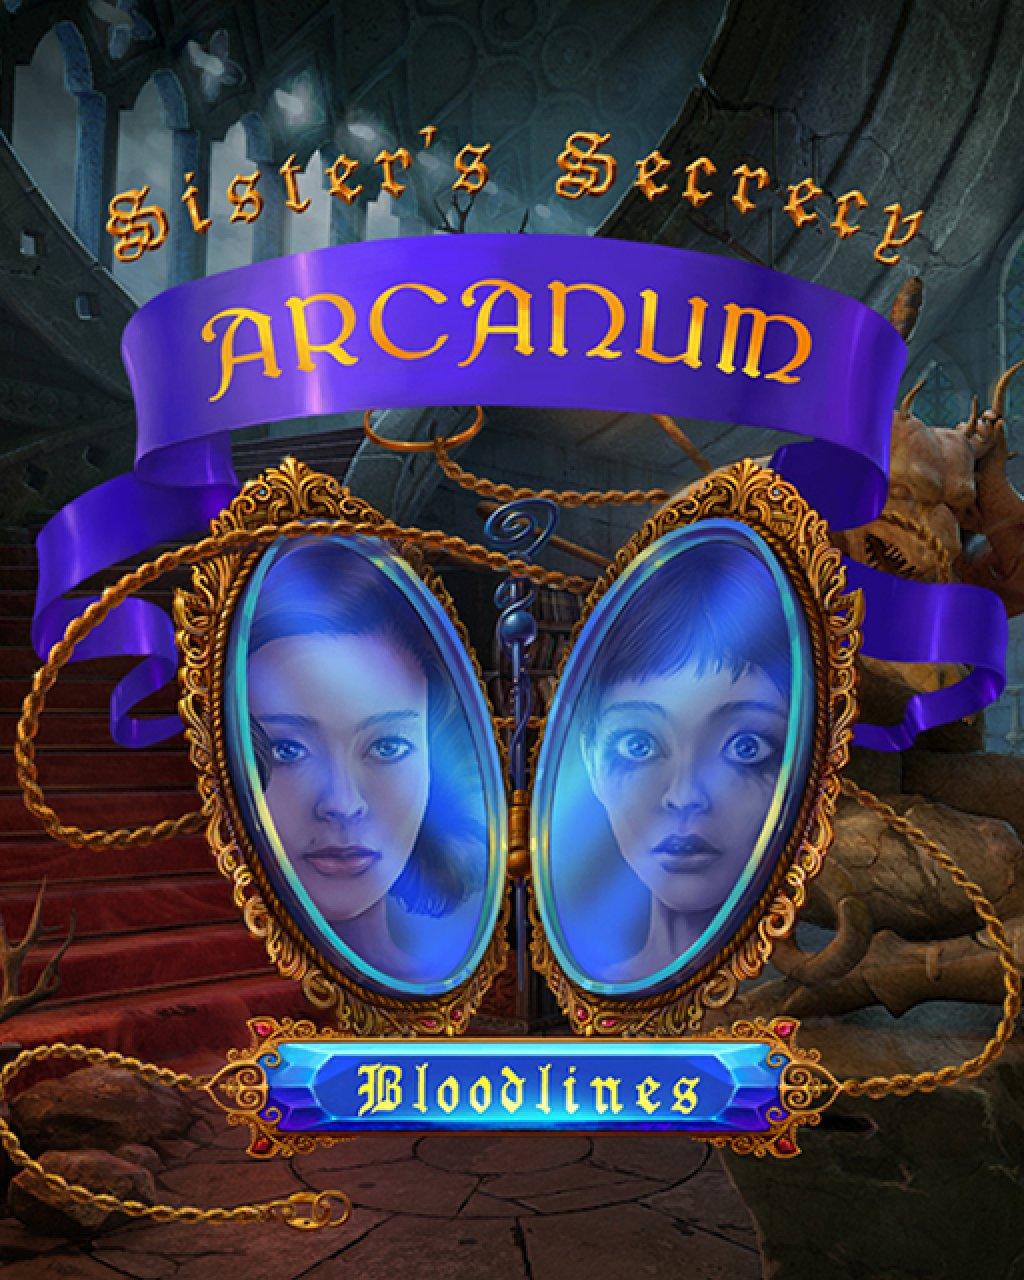 Sisters Secrecy Arcanum Bloodlines Premium Edition